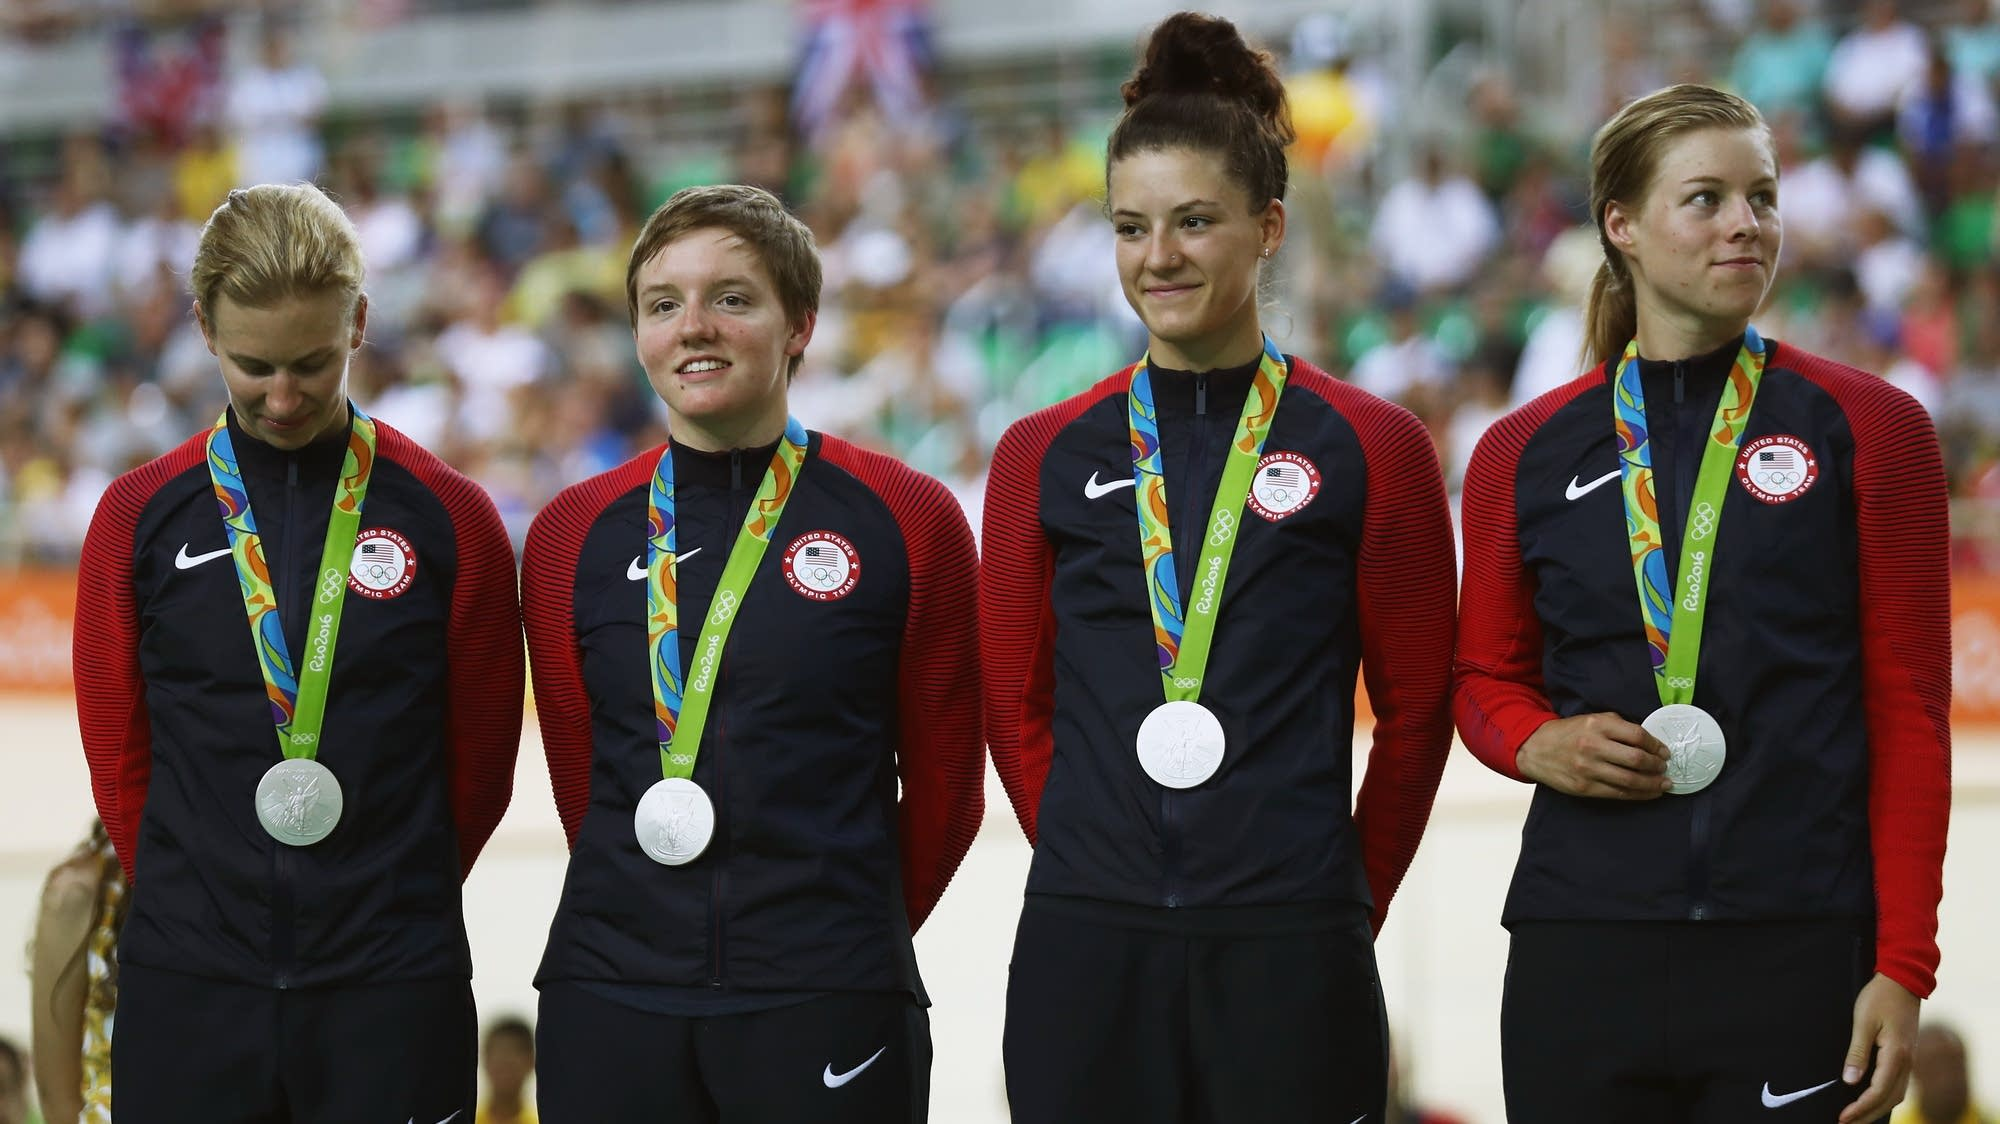 Silver medalist cyclists